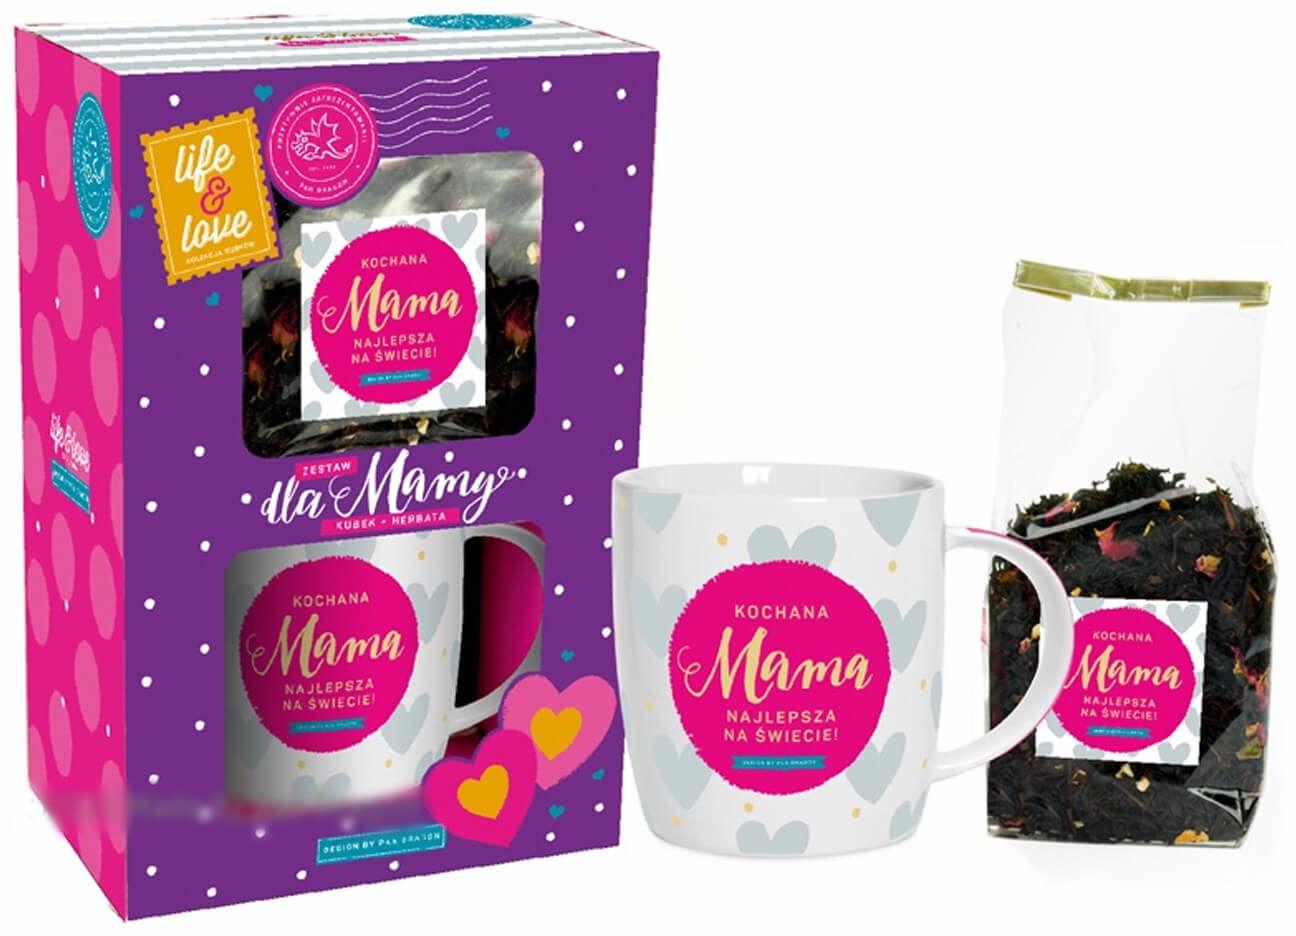 Kubek ceramiczny z napisem Kochana Mama + herbatka